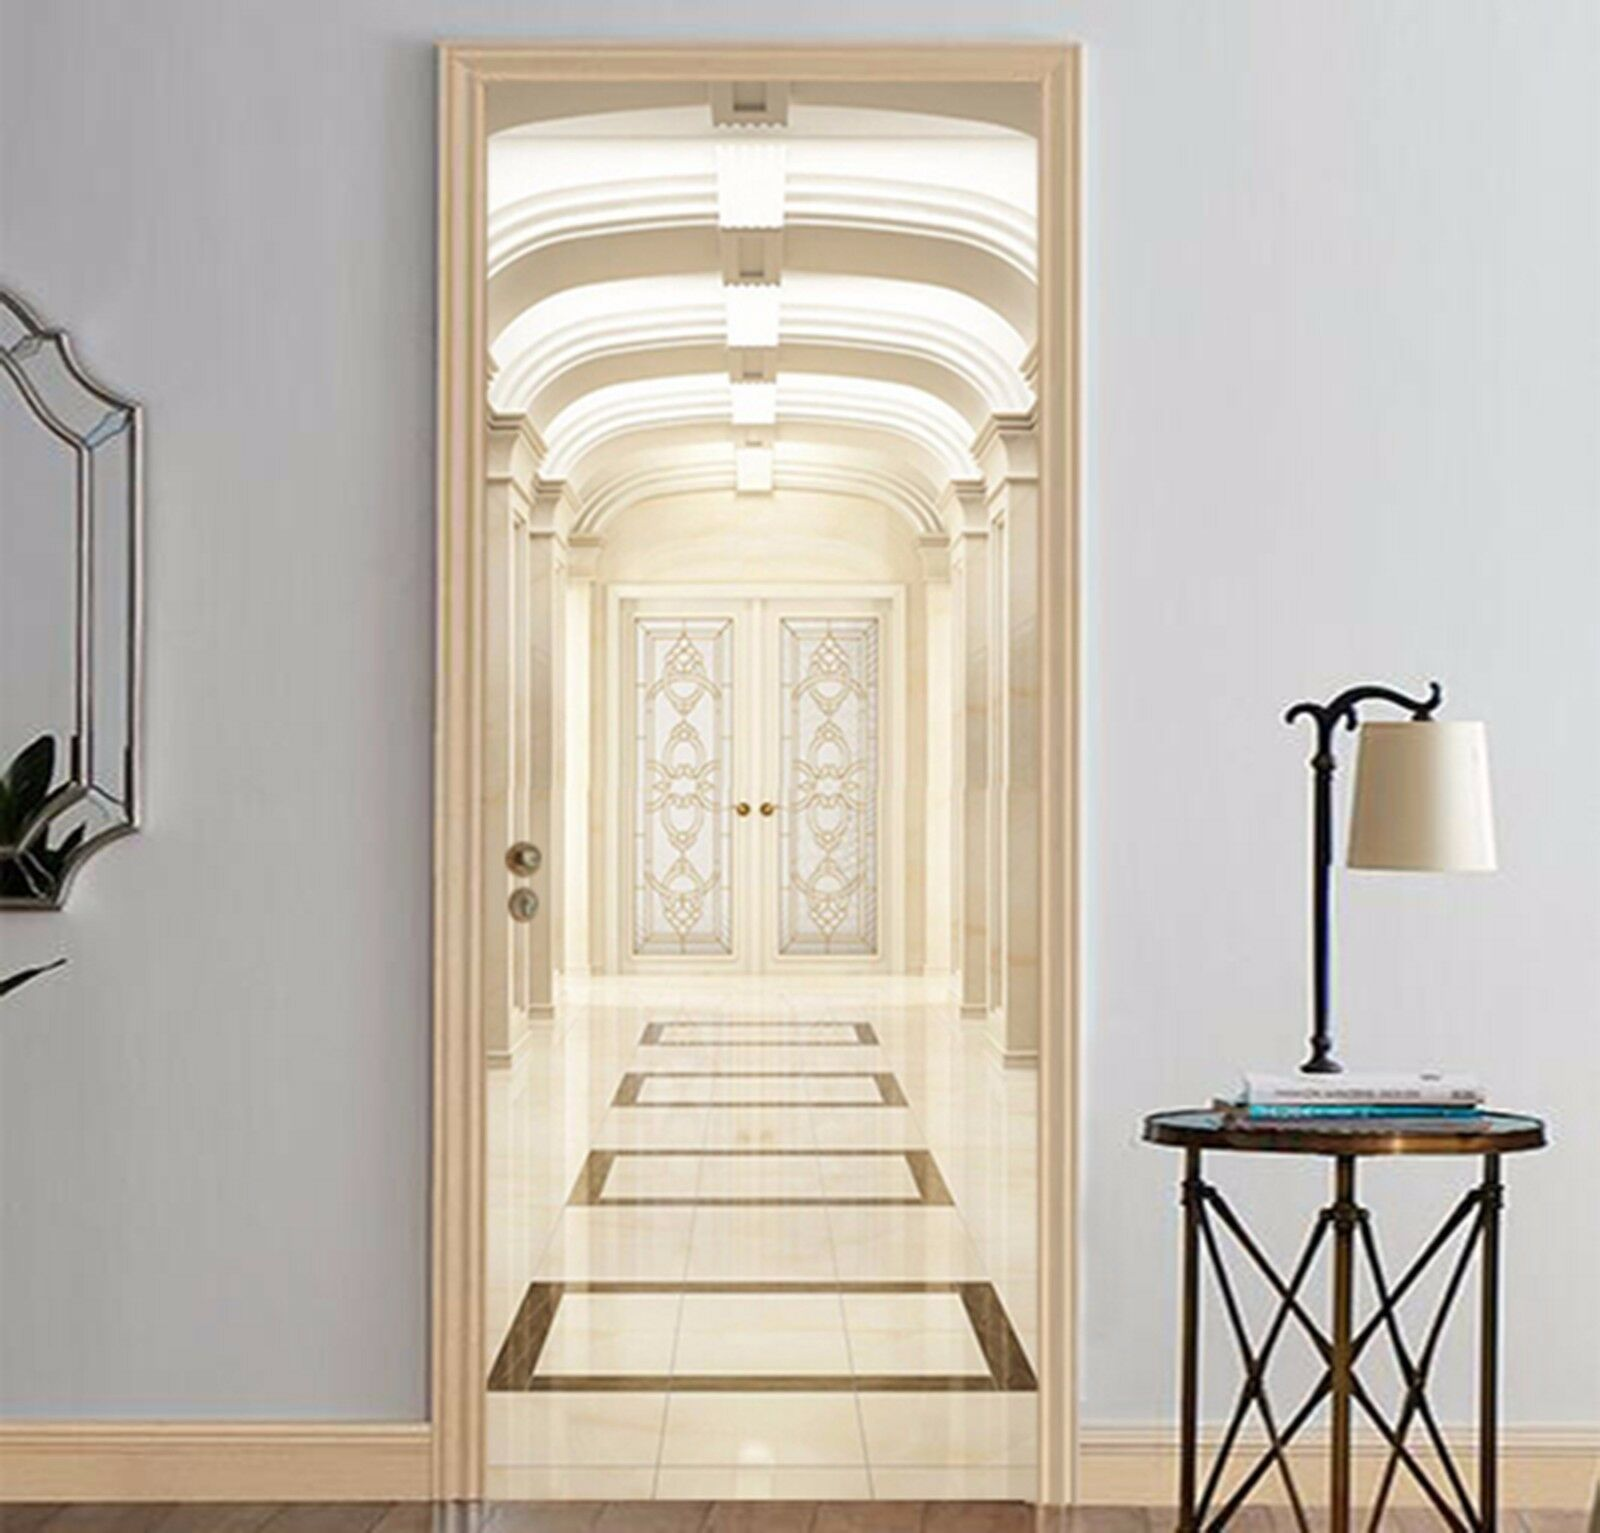 3D Korridor 752 Tür Wandmalerei Wandaufkleber Aufkleber AJ WALLPAPER DE Kyra